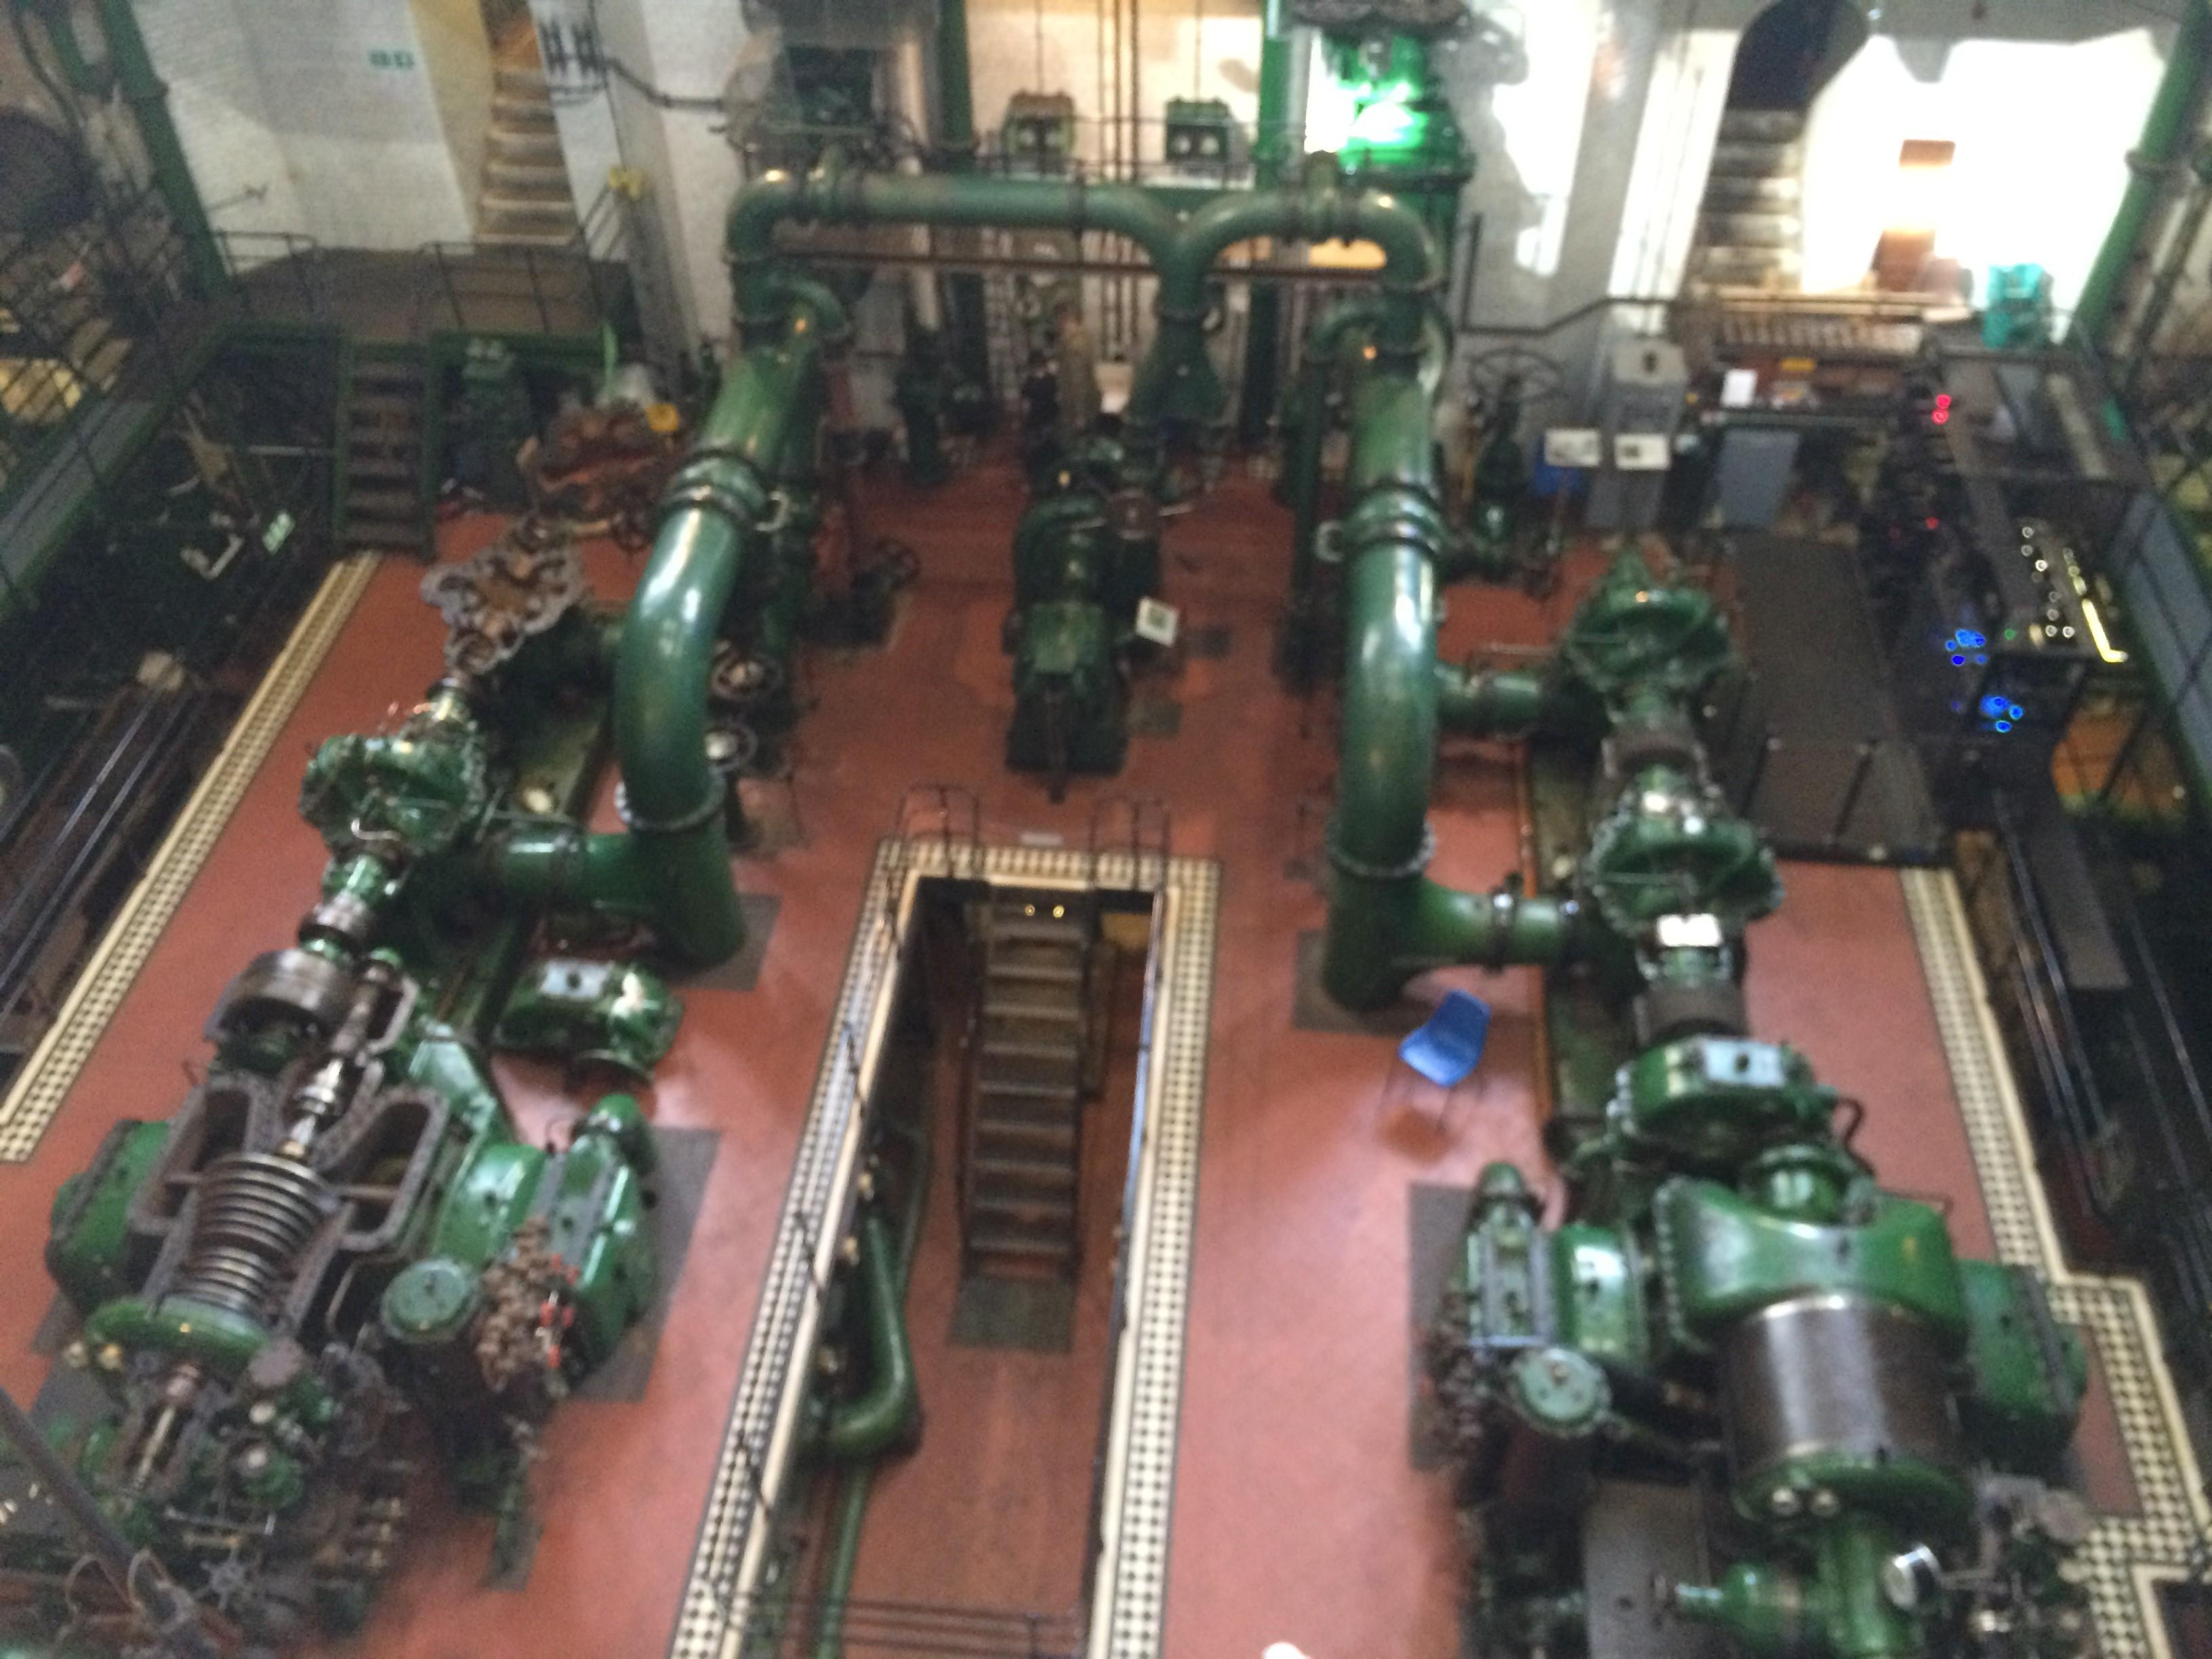 Kempton Steam Museum Jagz n Tech